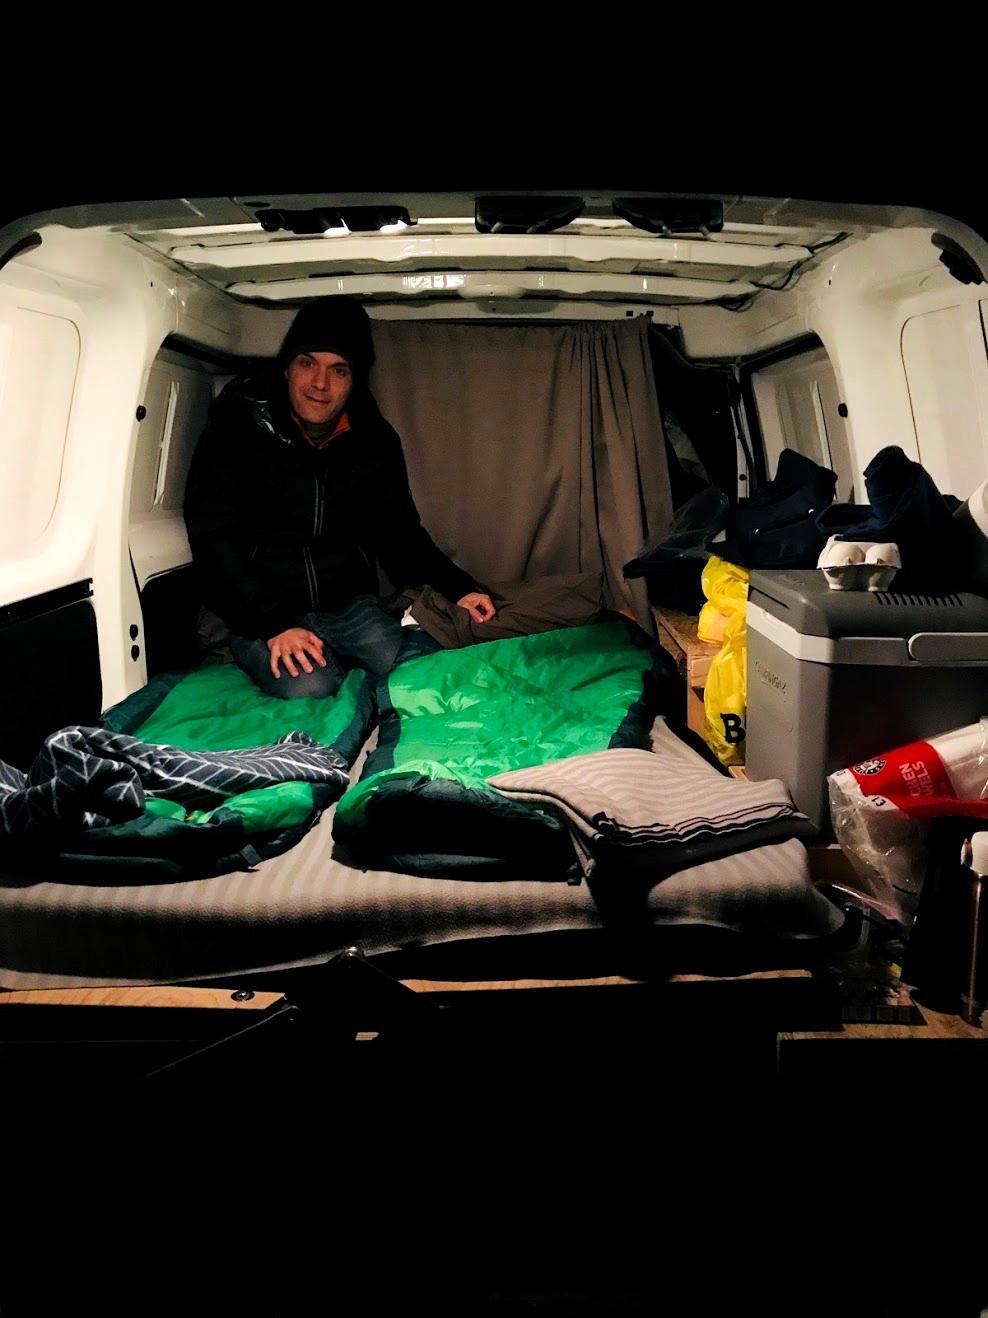 Sleeping in a campervan in Iceland